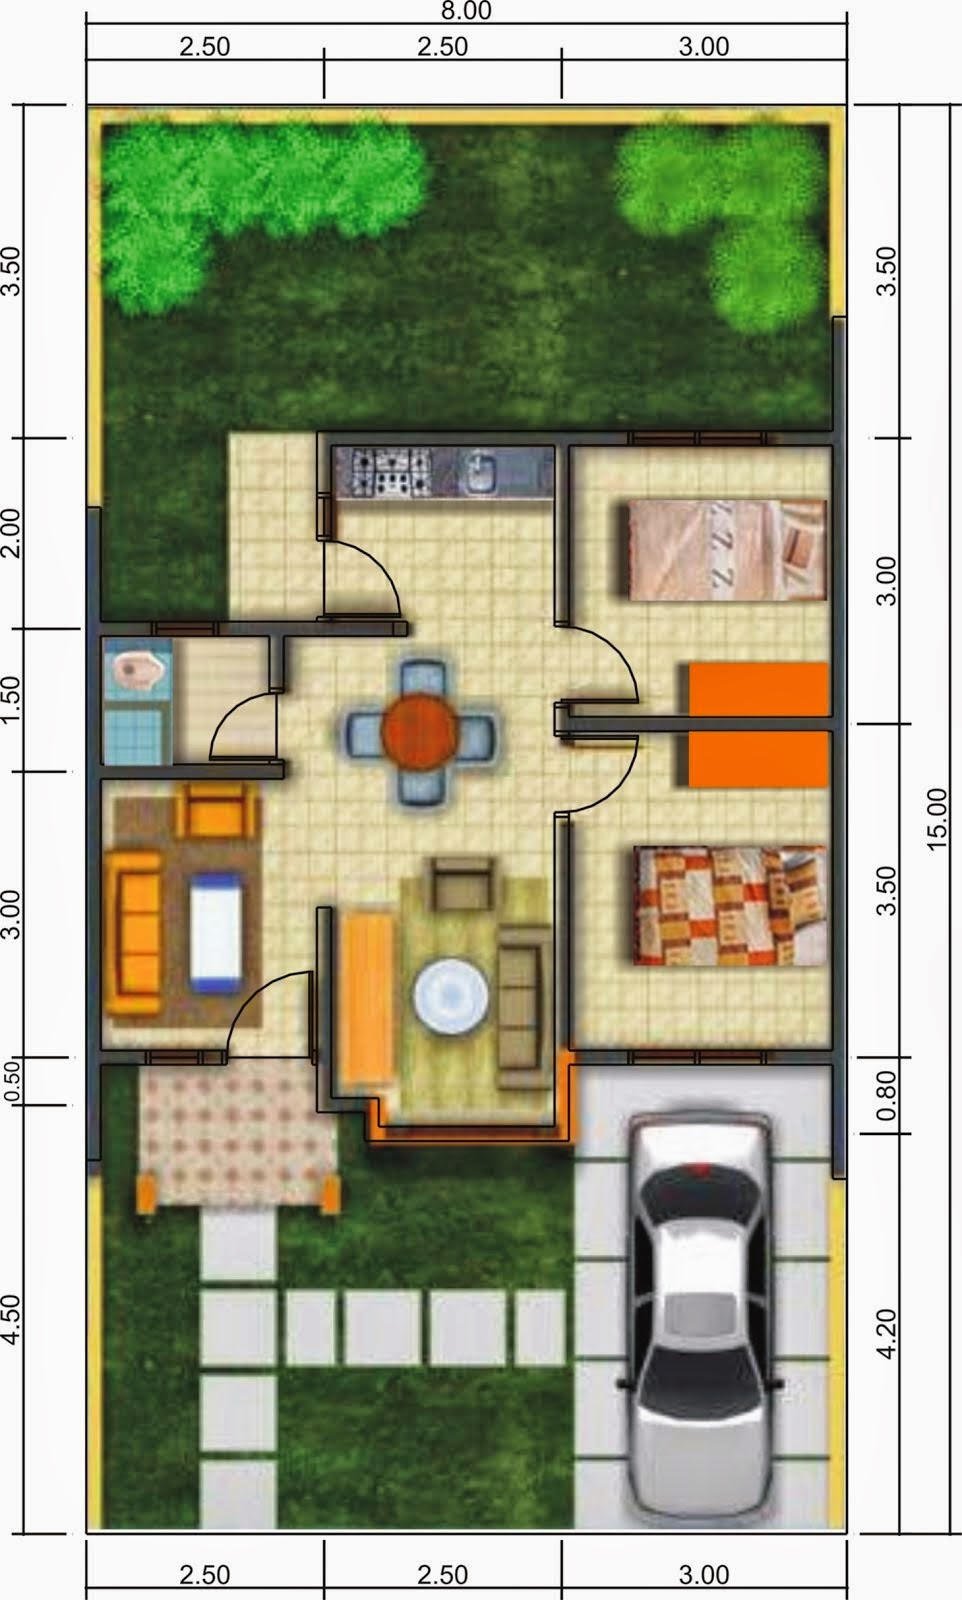 Gambar Denah Rumah Minimalis Modern 1 Lantai Terbaru 2020